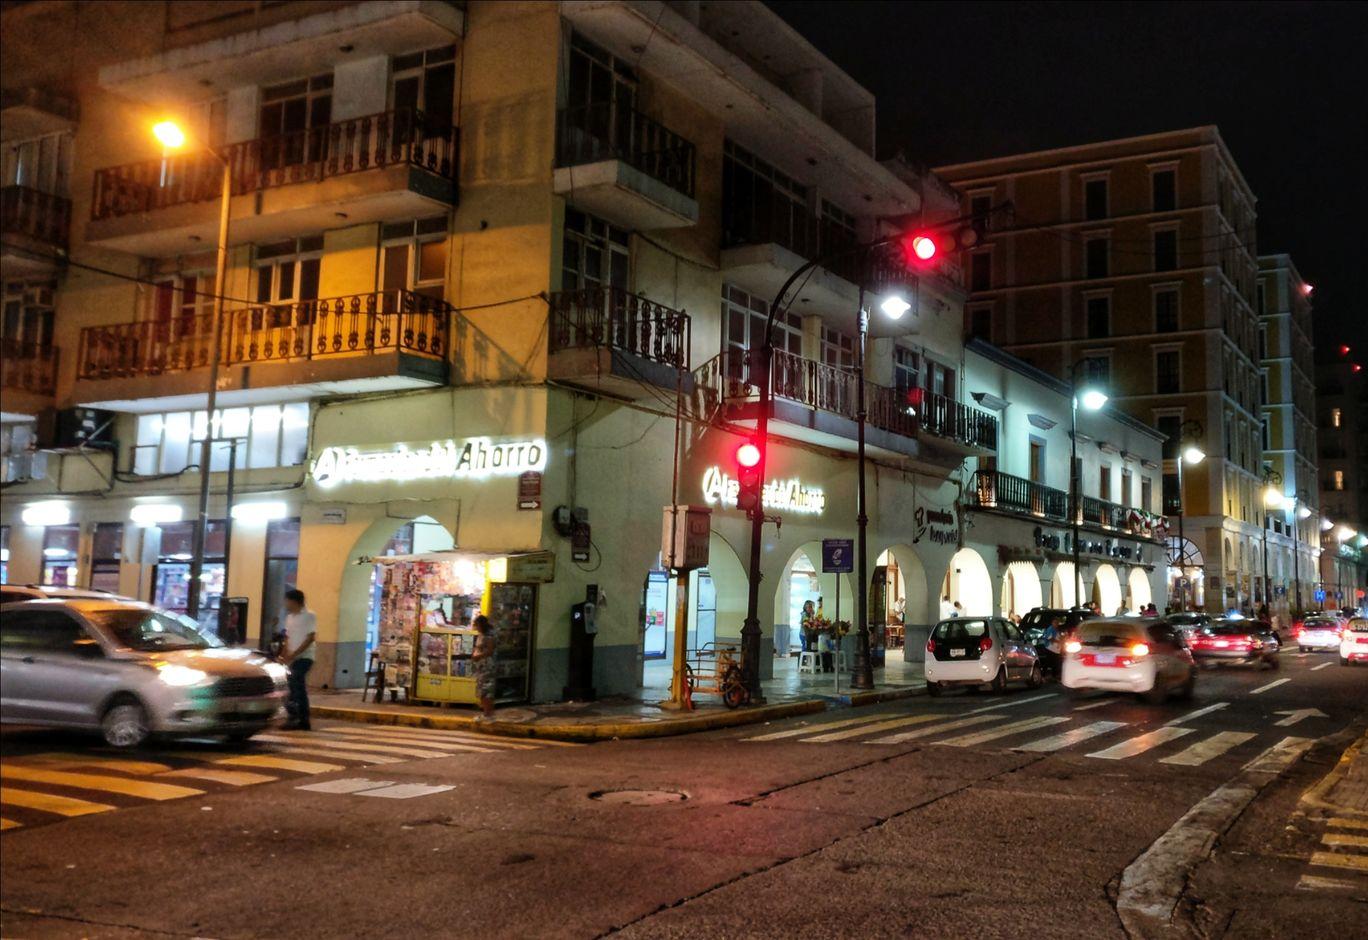 Photo of Veracruz By Max Dcruz